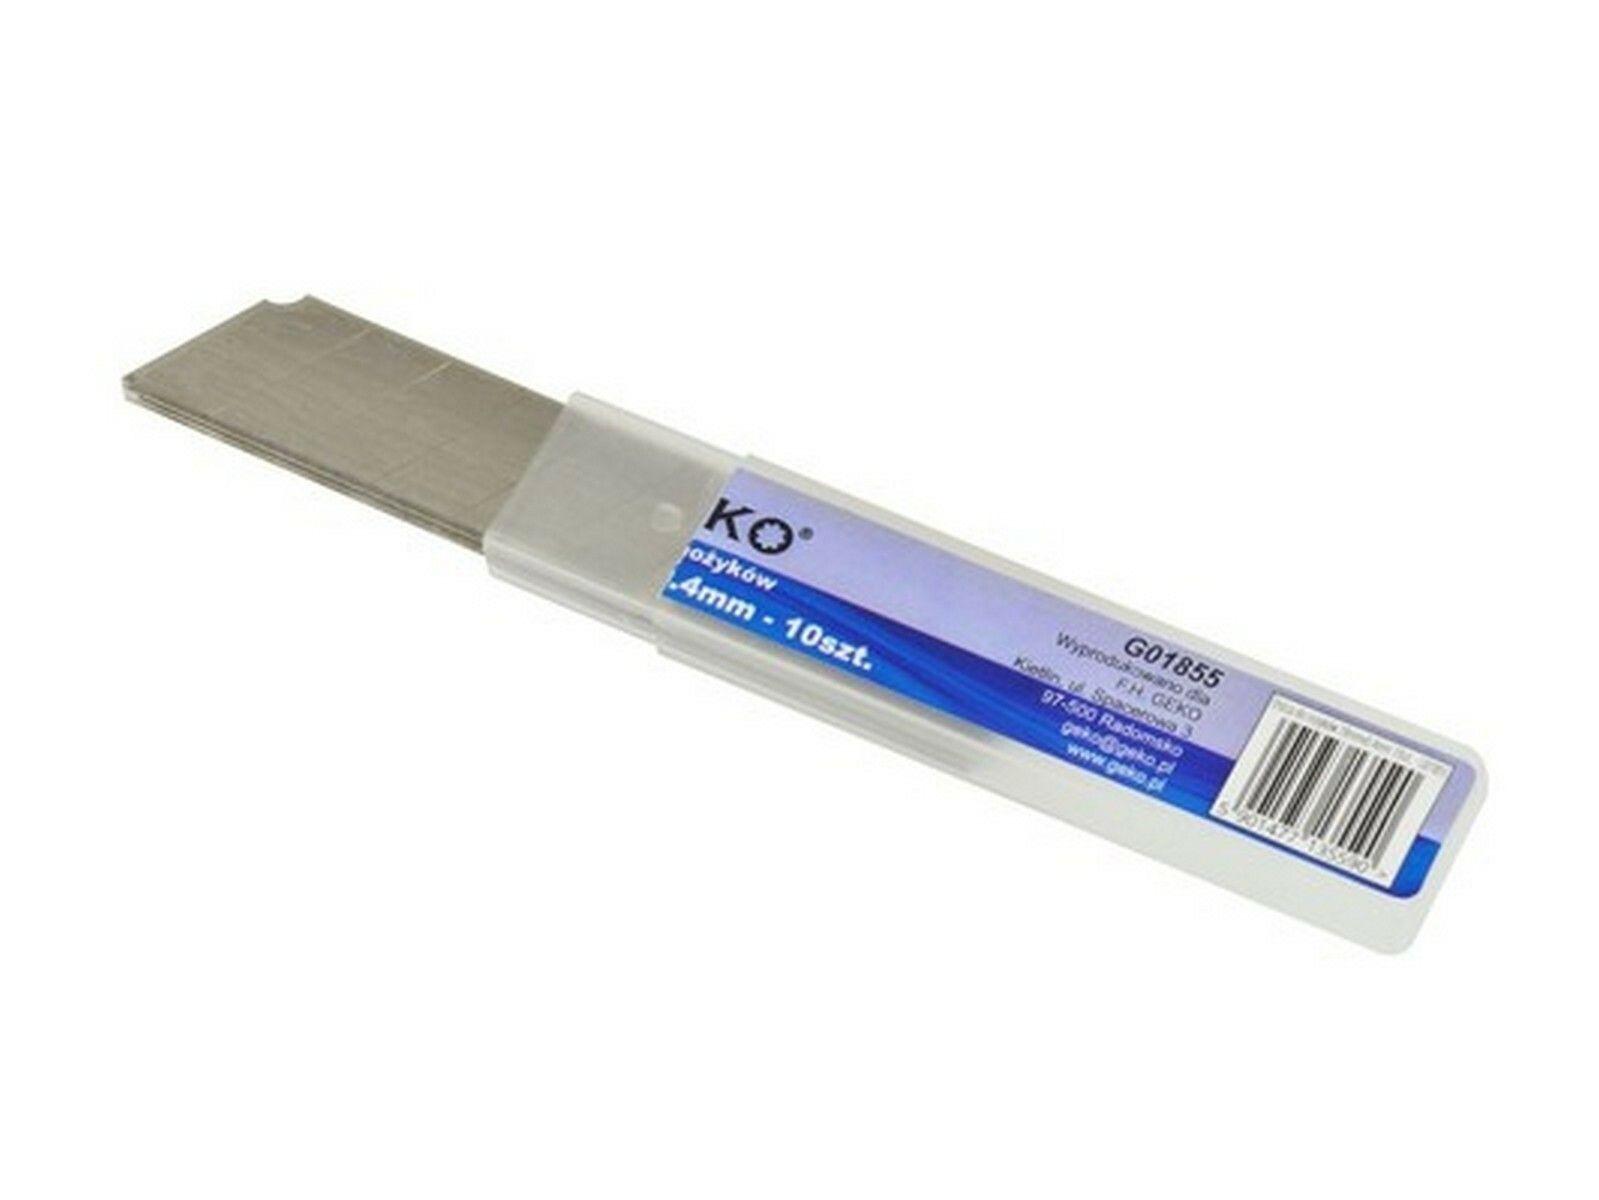 Břity ulamovací do nože, 18 mm, 10ks GEKO